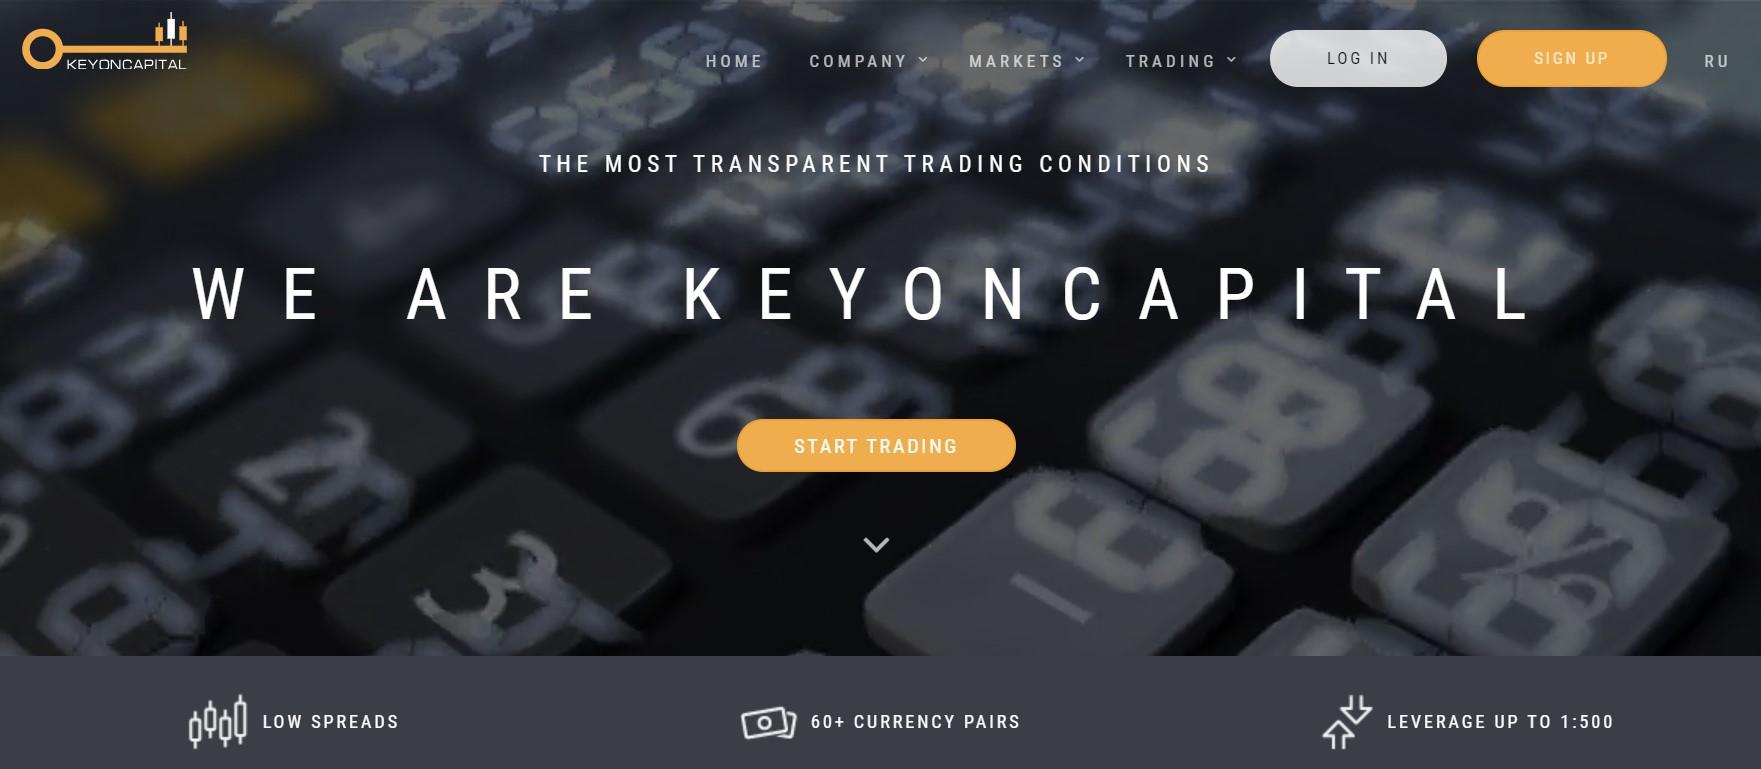 Key on capital landing page